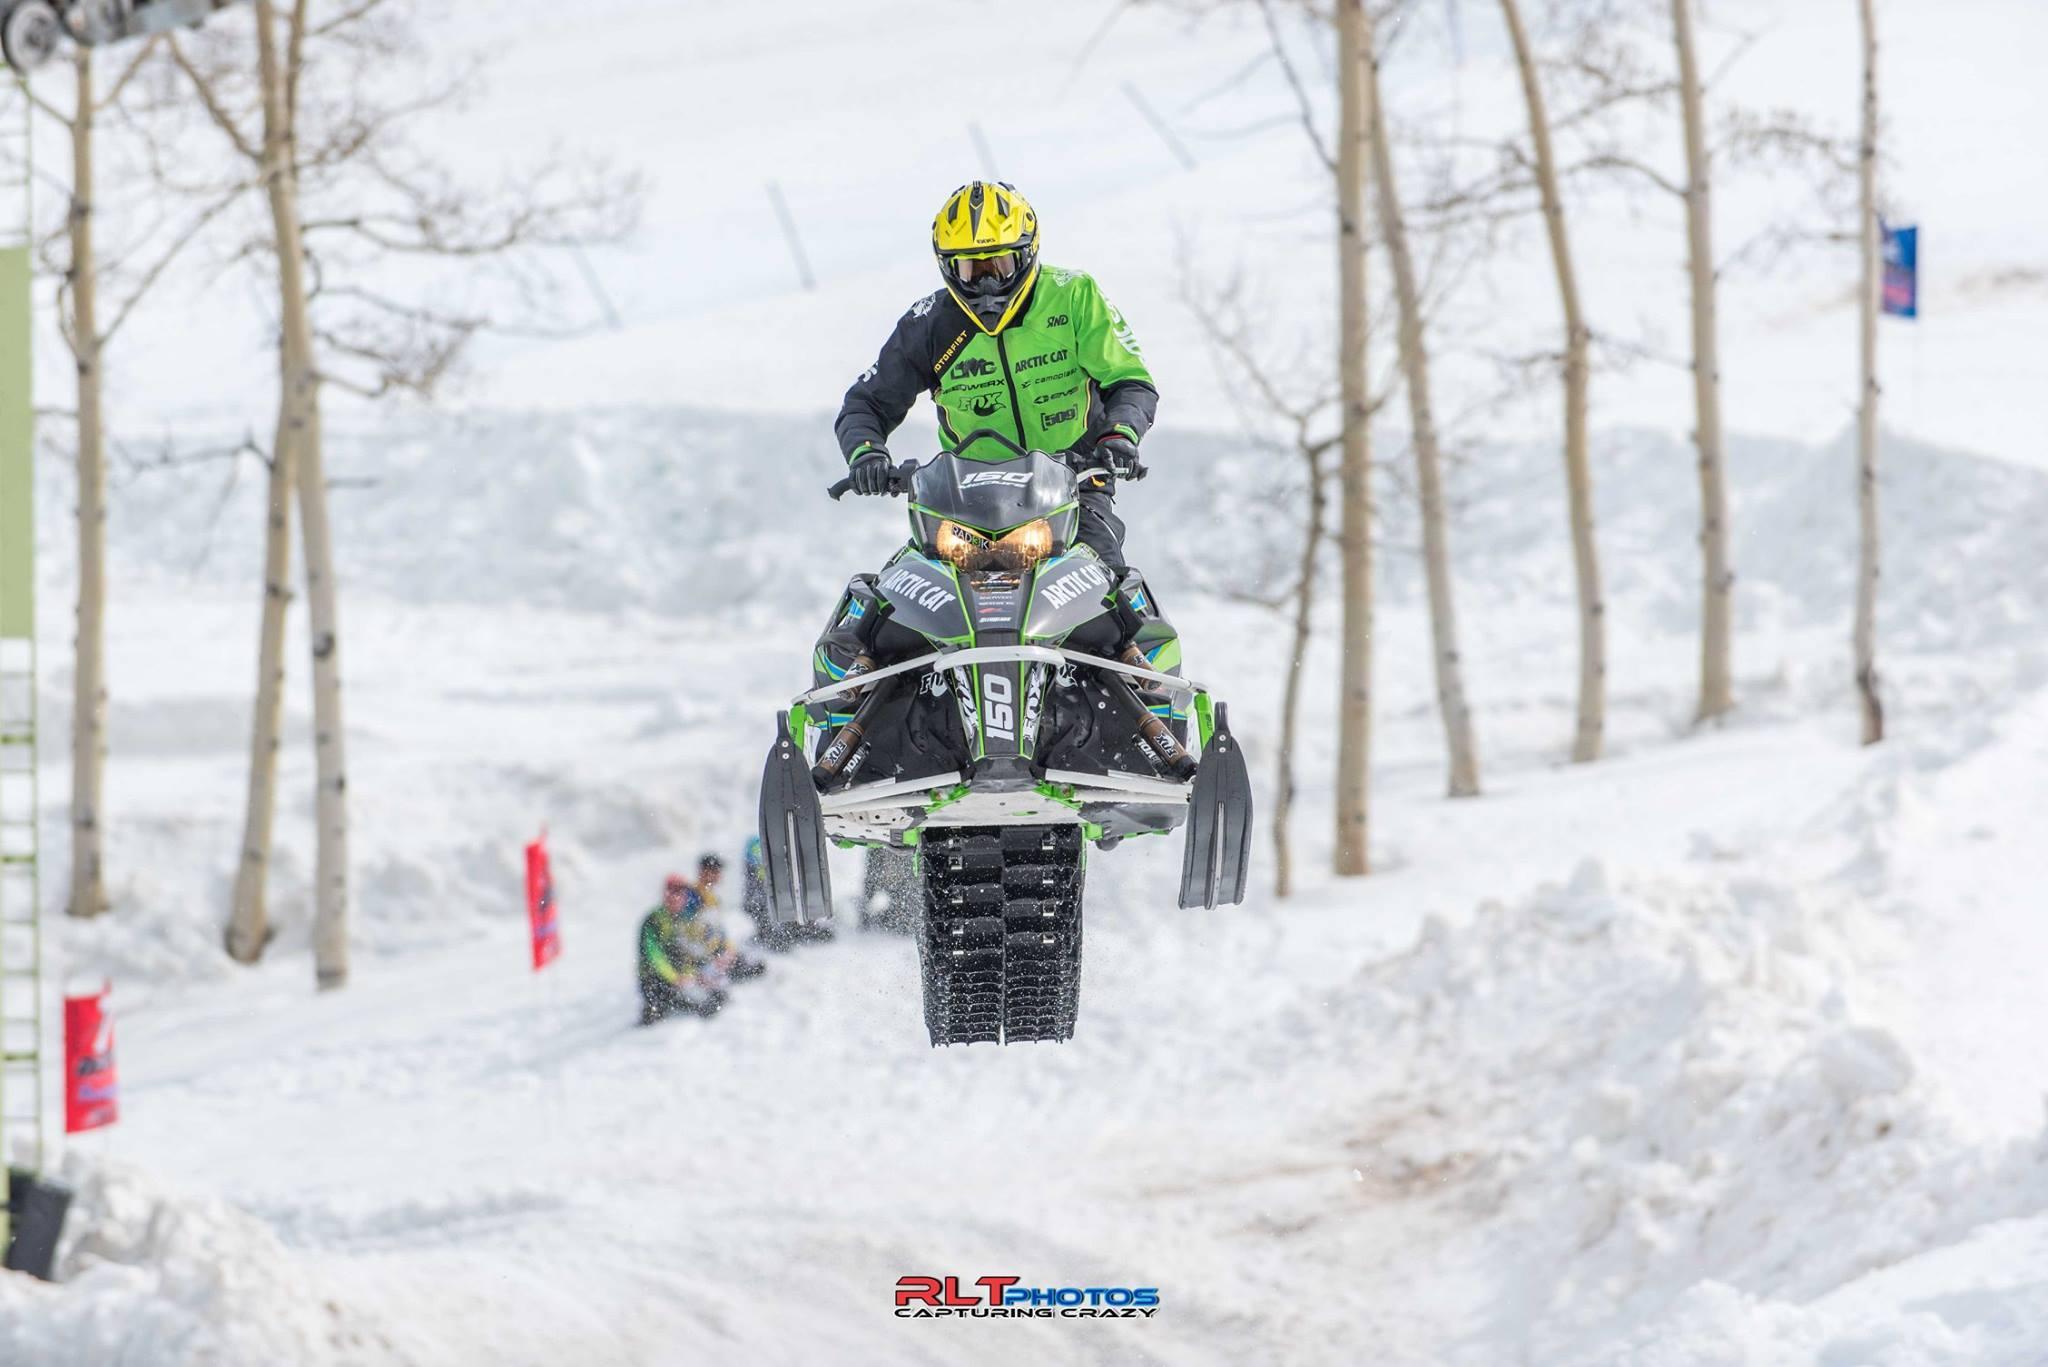 Team Arctic's David McClure wins Crazy Horse 2016. Photo by RLT Photos.